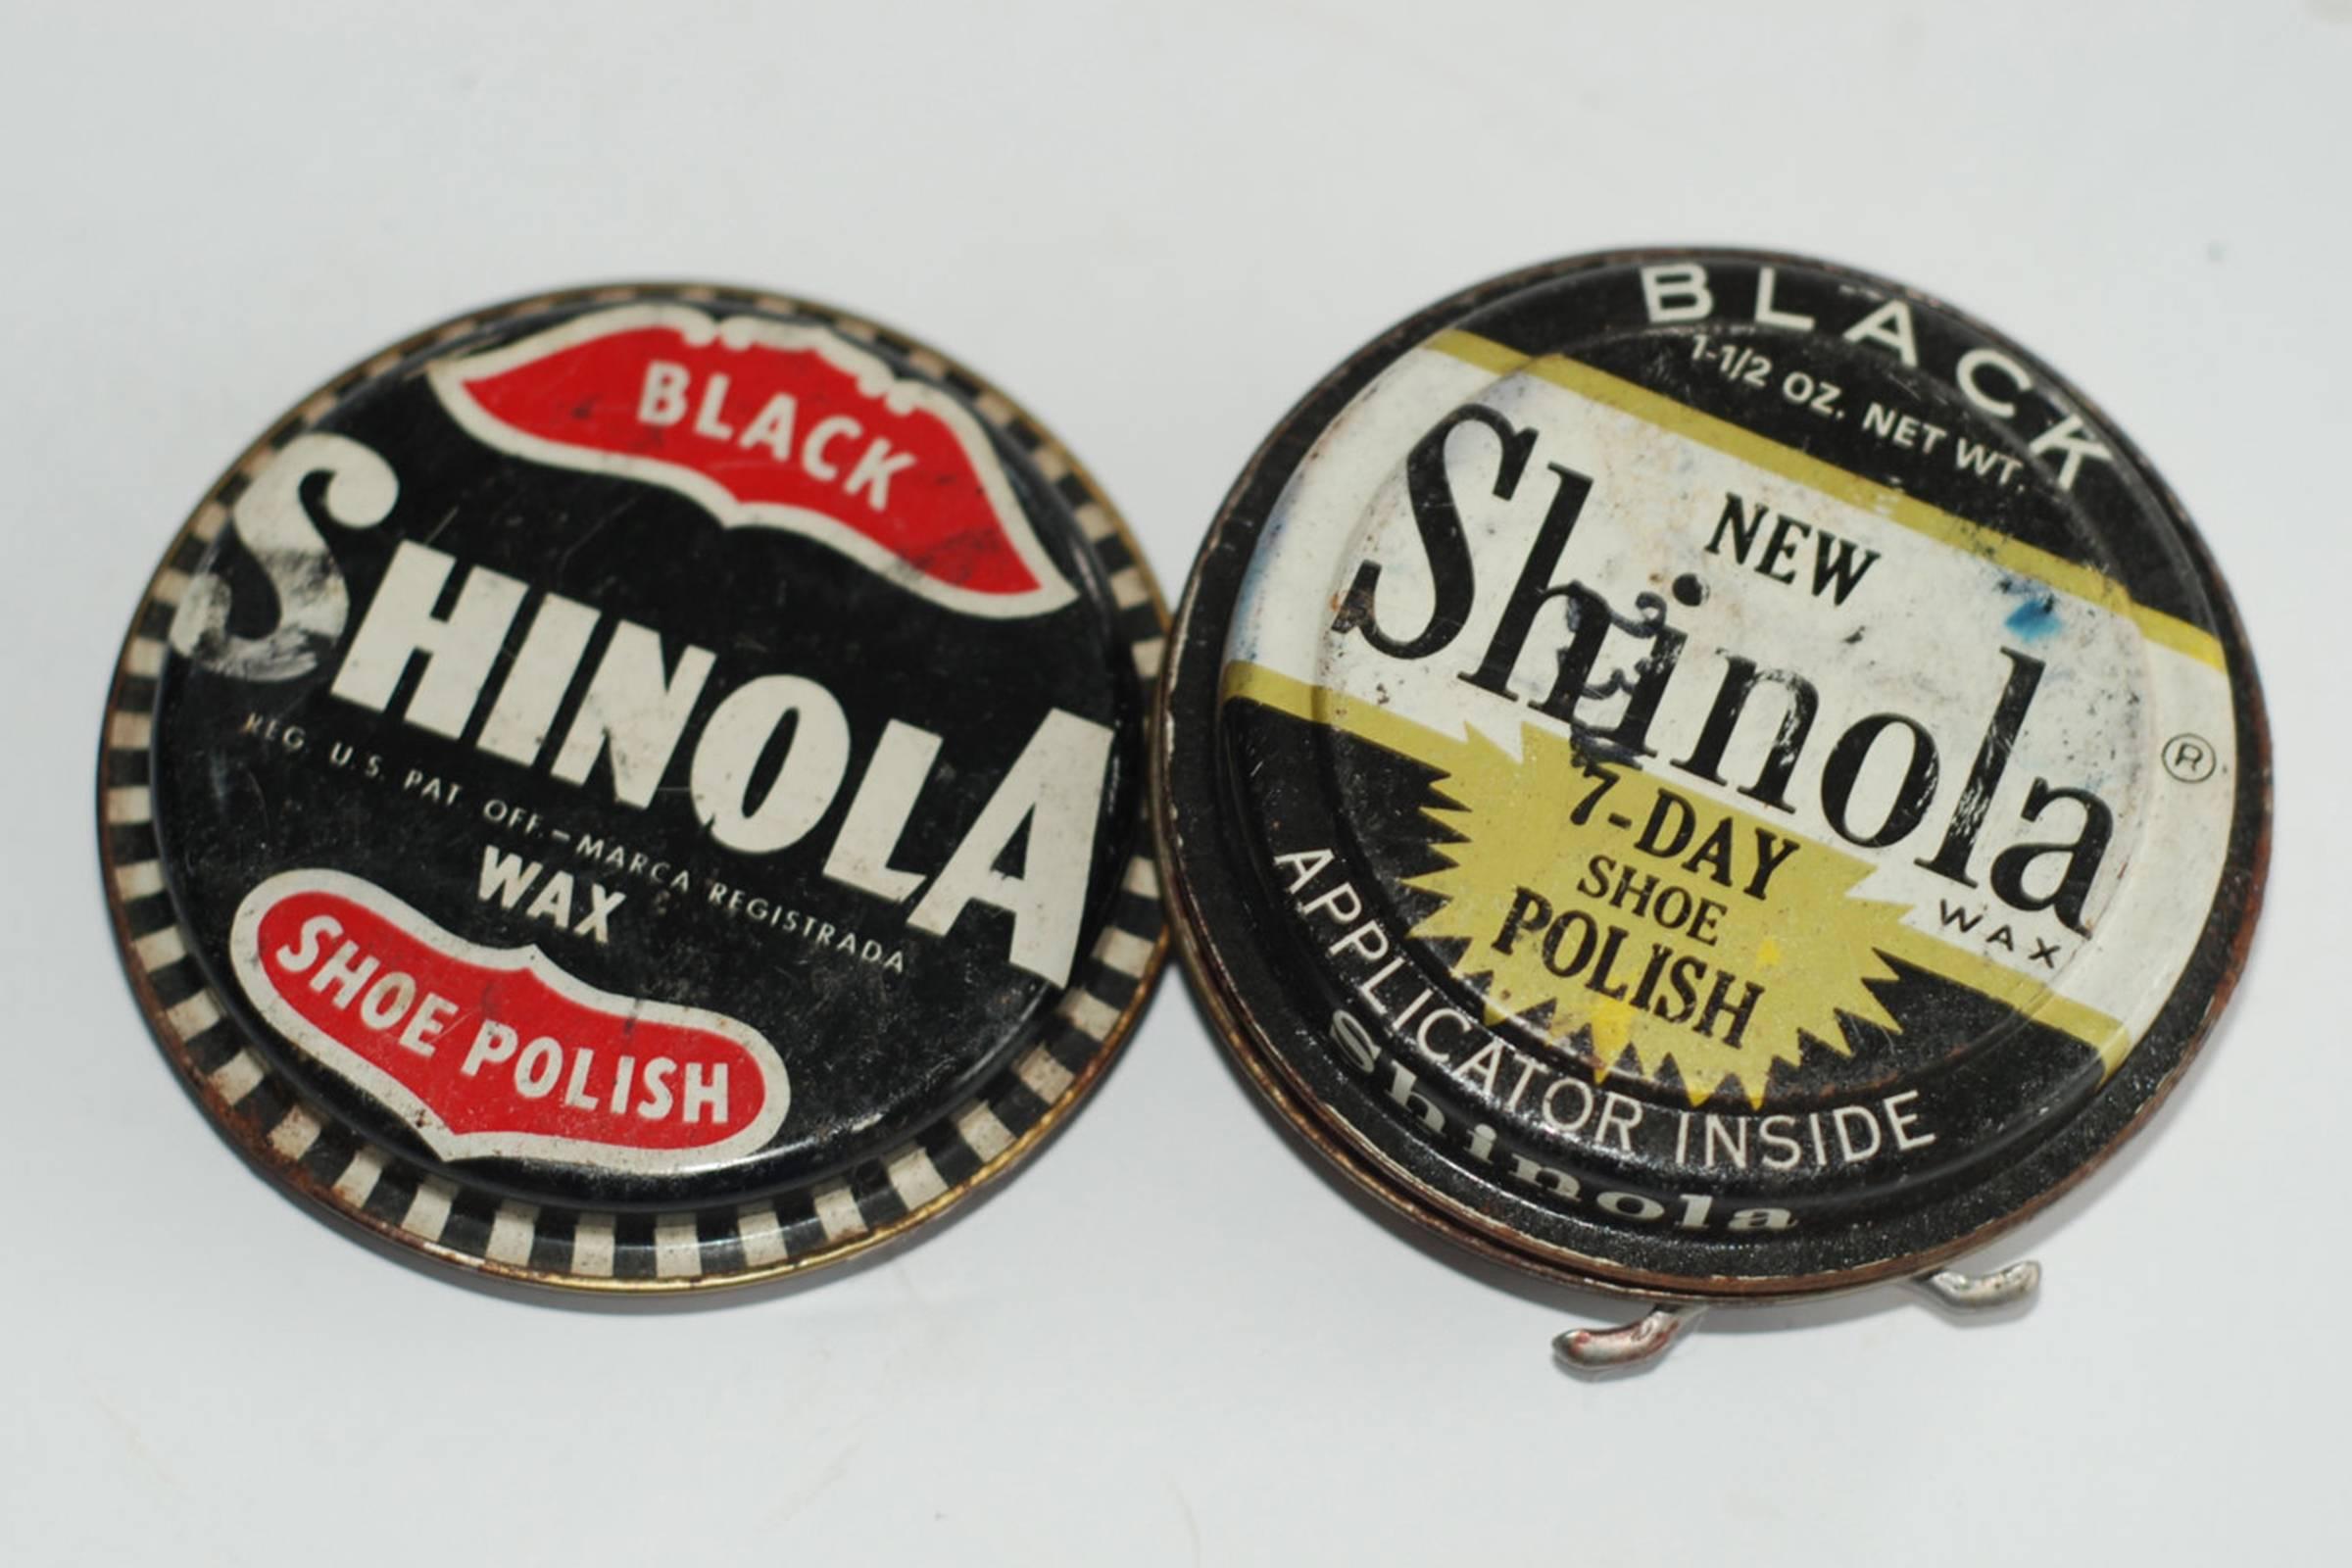 The last generation of Shinola Shoe Polish (c. 1950)